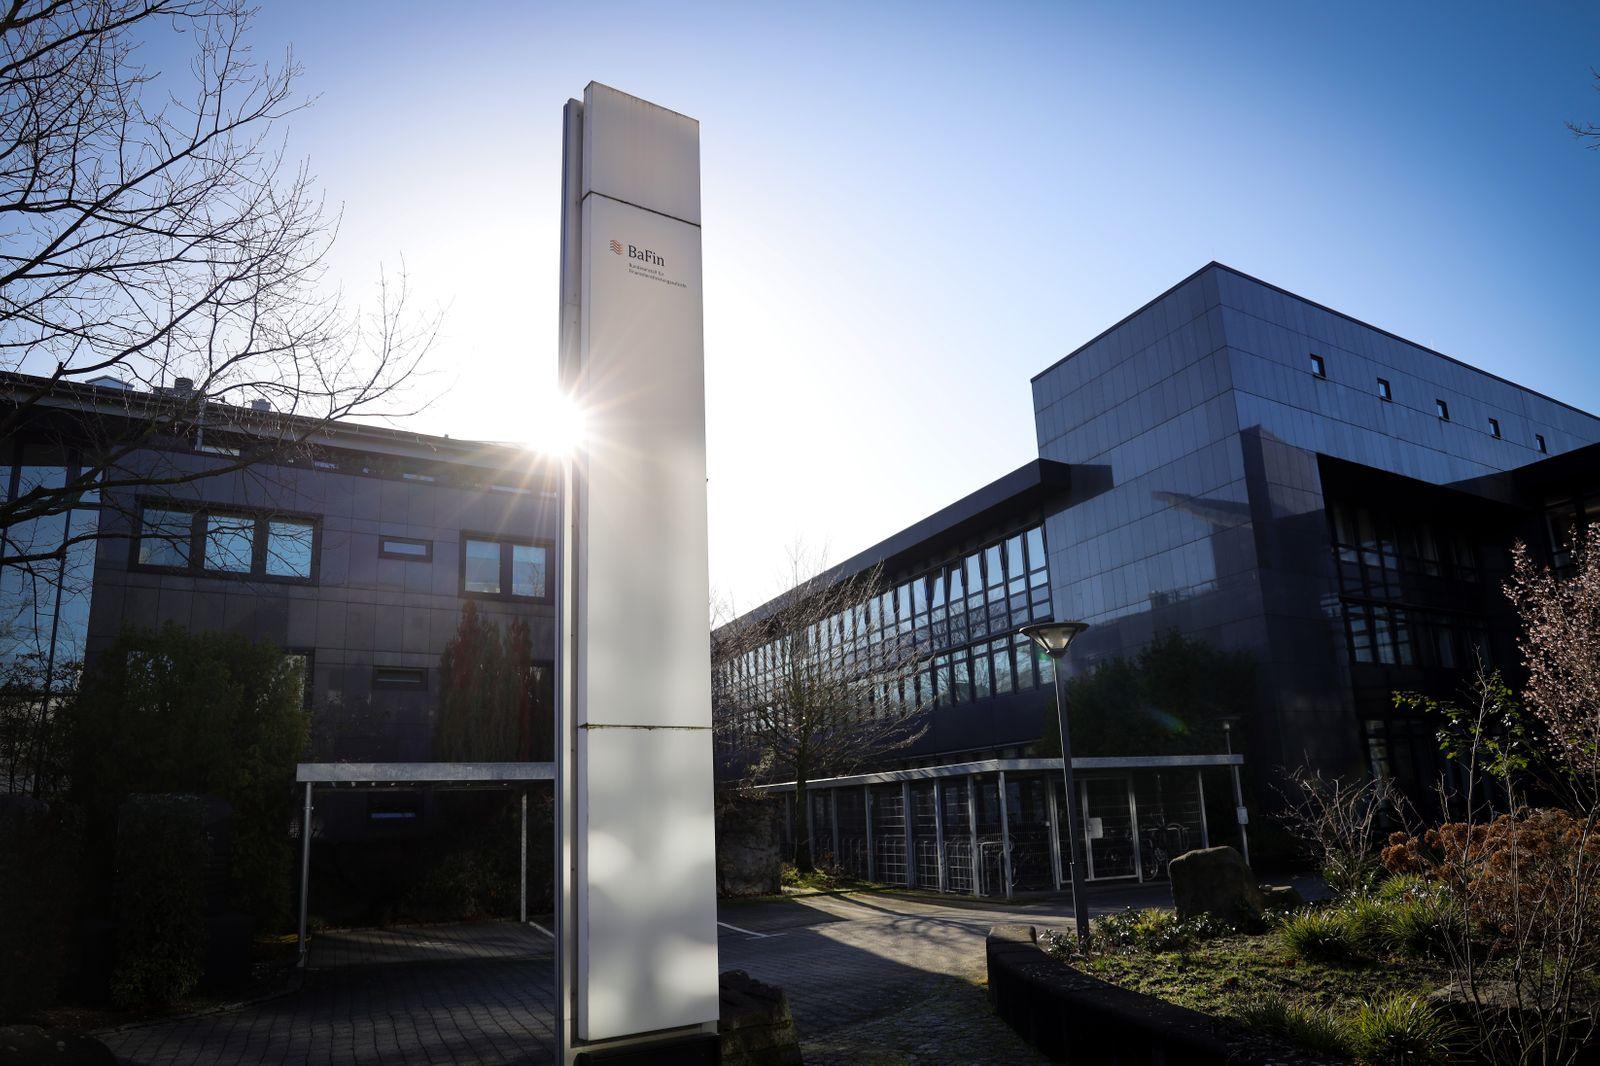 Finance Regulator BaFin Faces Overhaul Following Wirecard Debacle